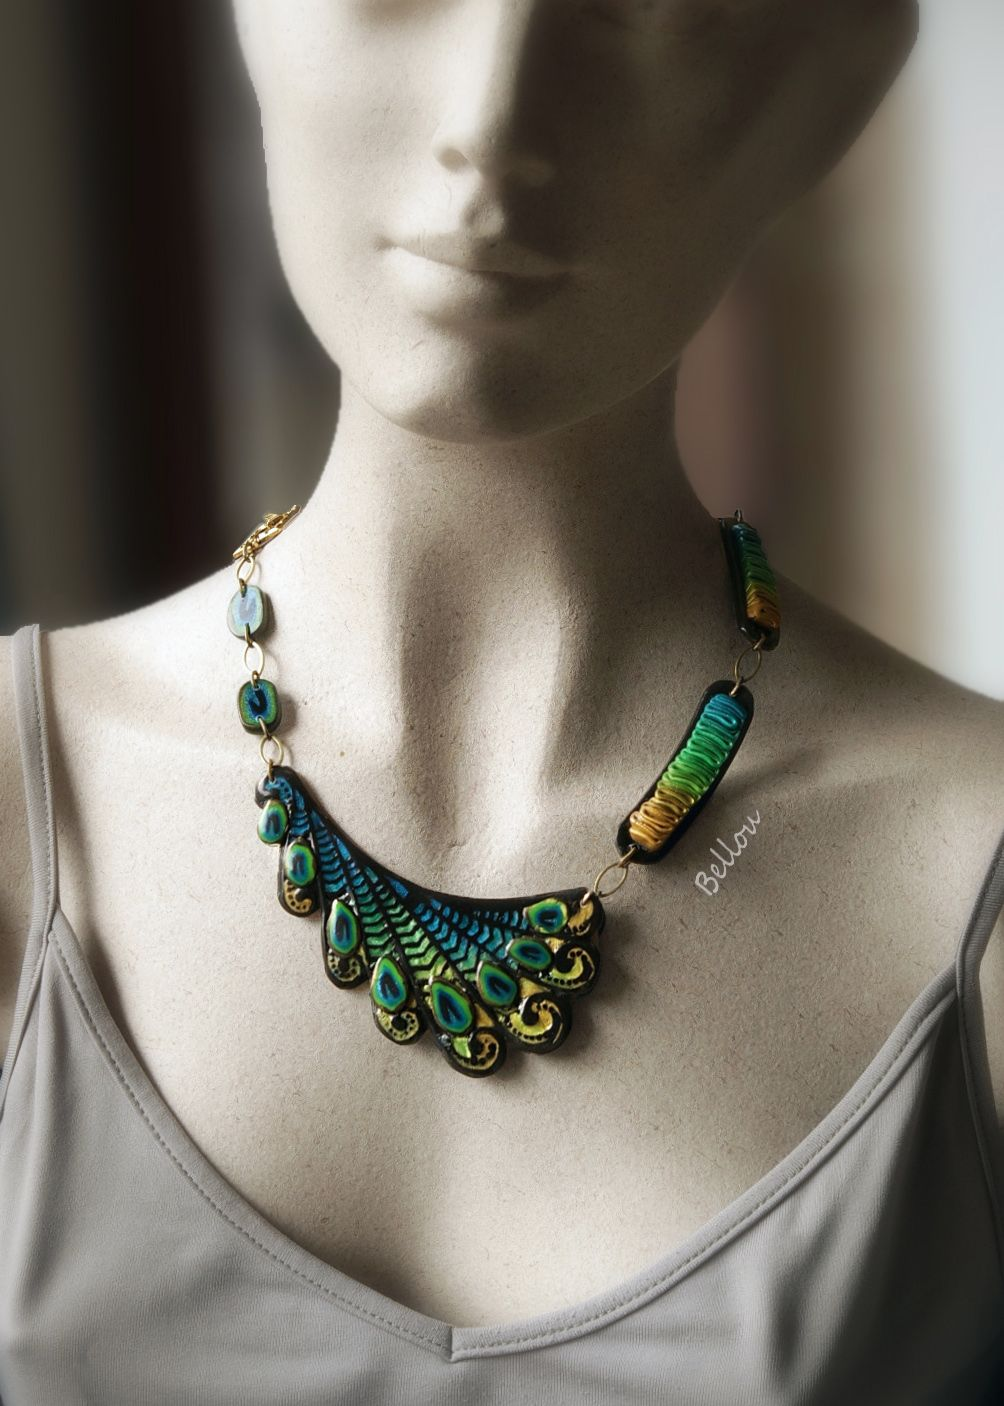 clay jewelry making ideas